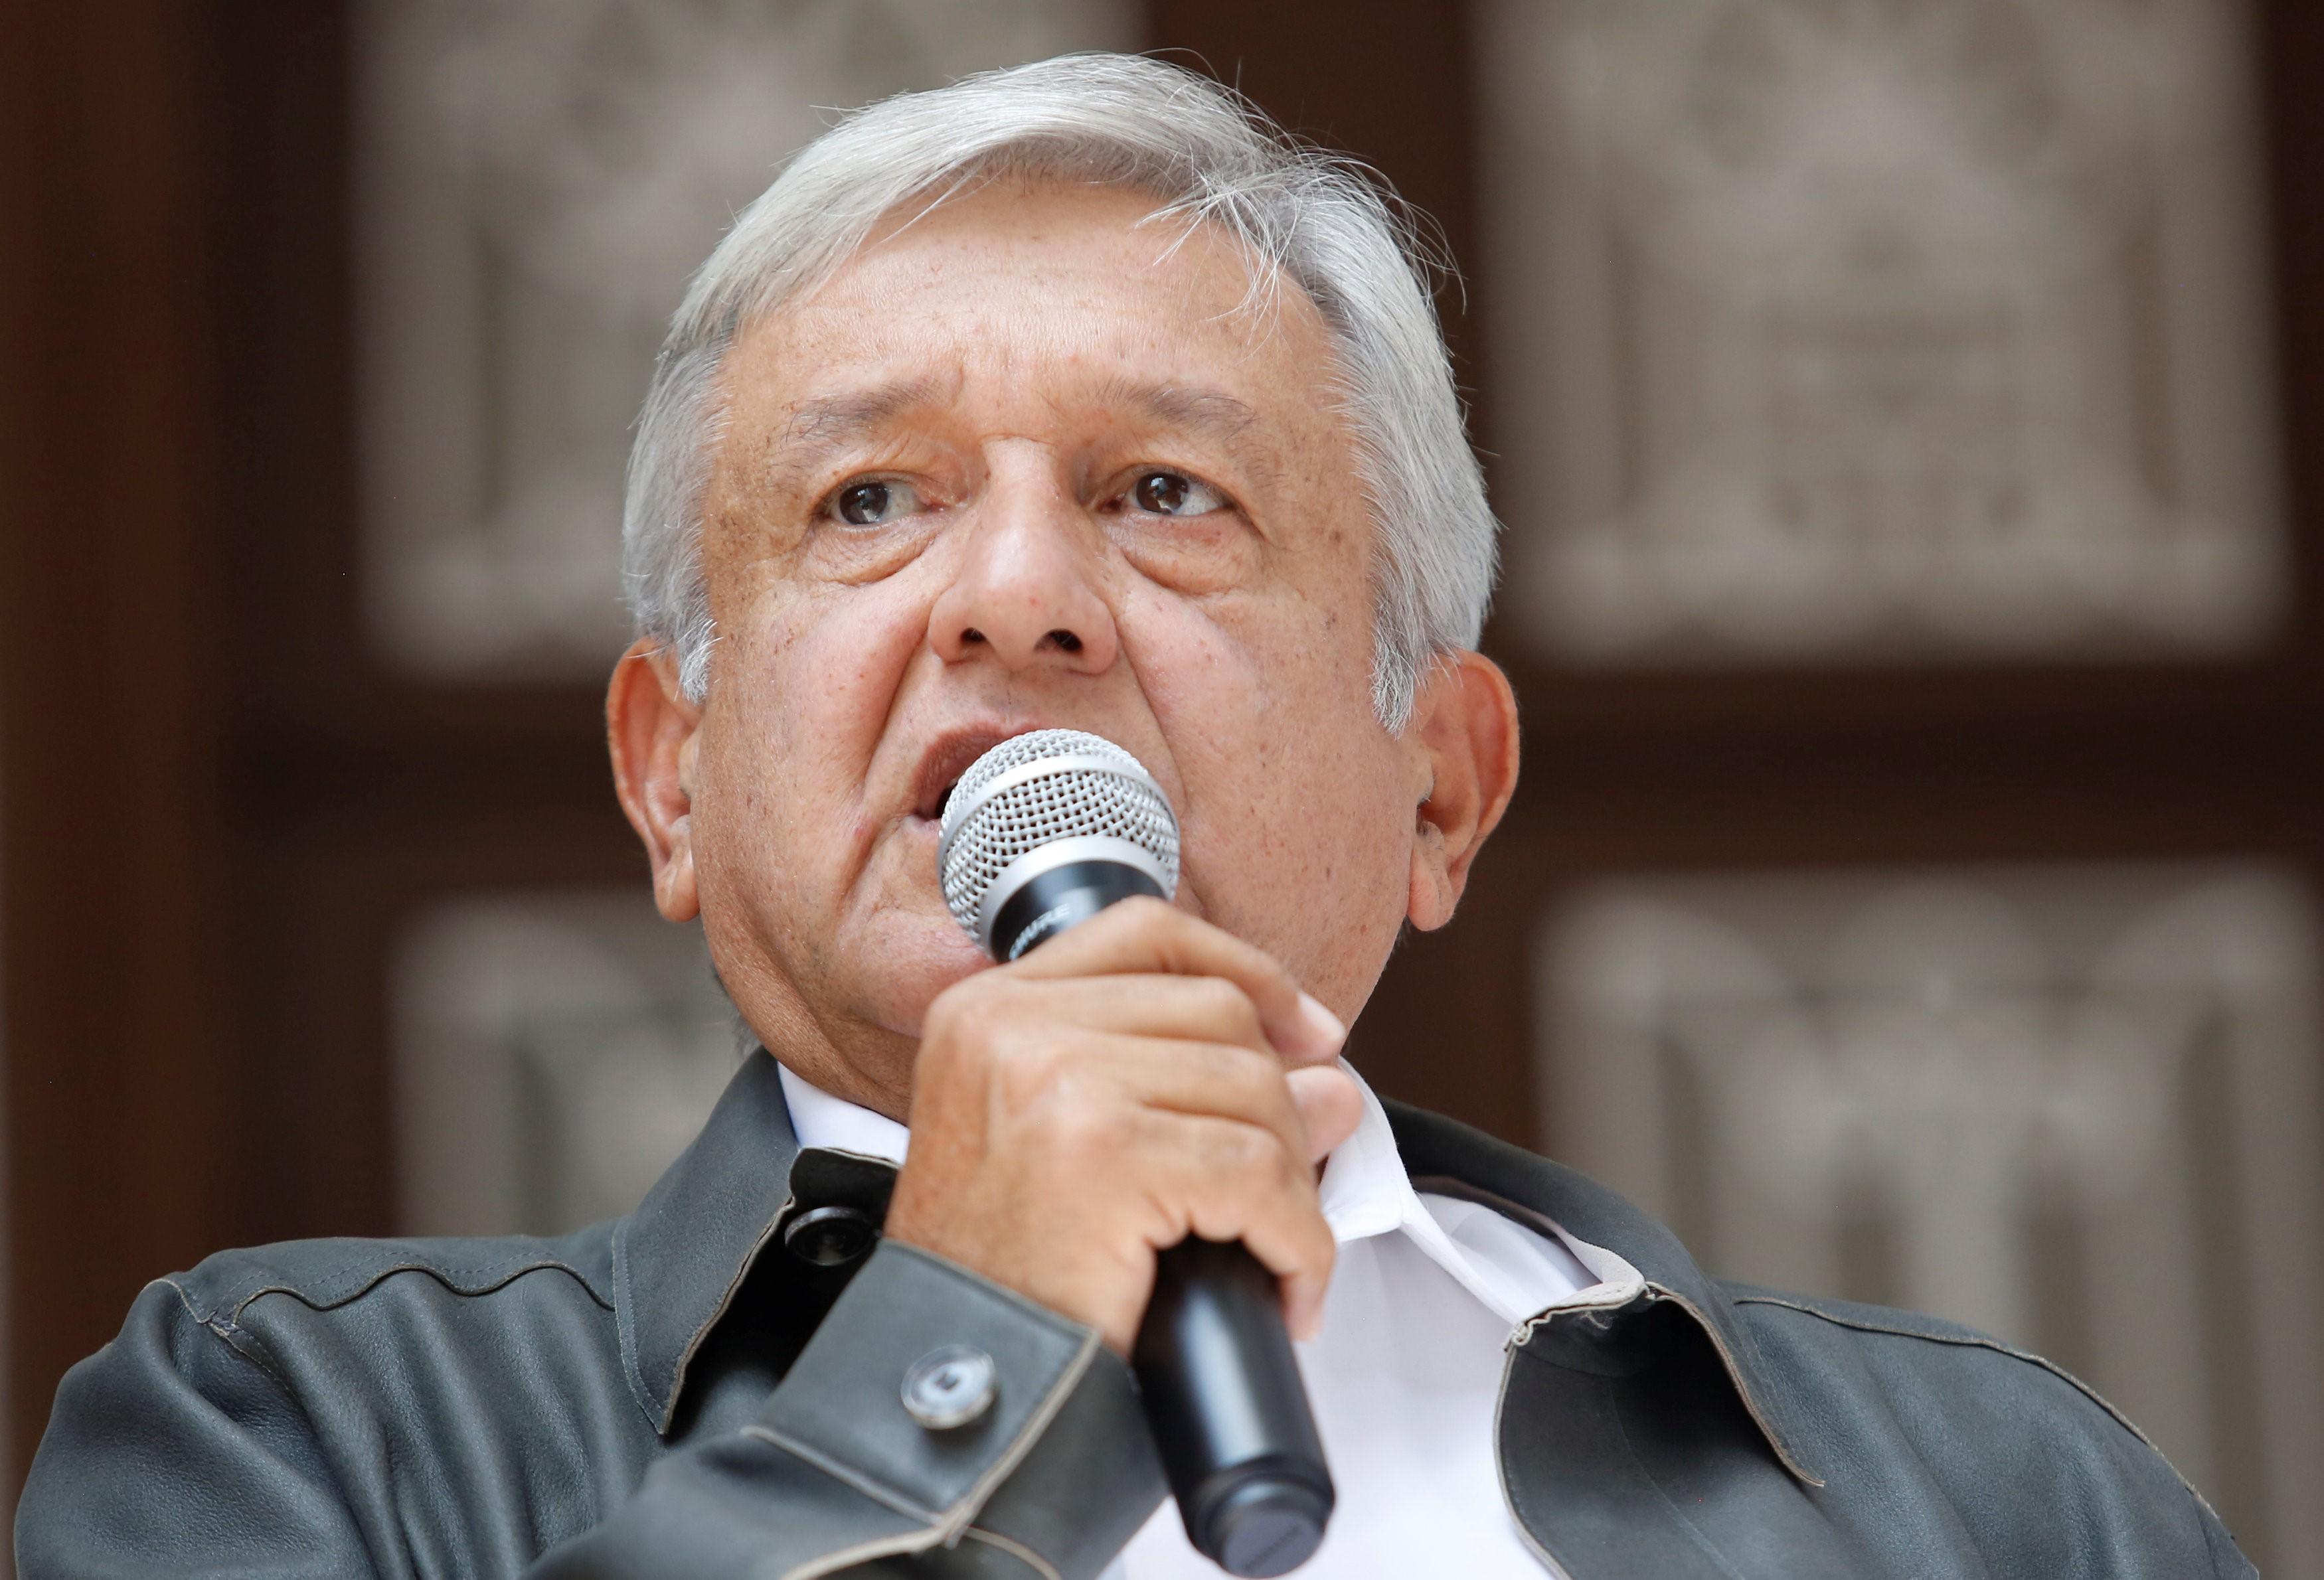 NAIM, a consulta en octubre, explica López Obrador